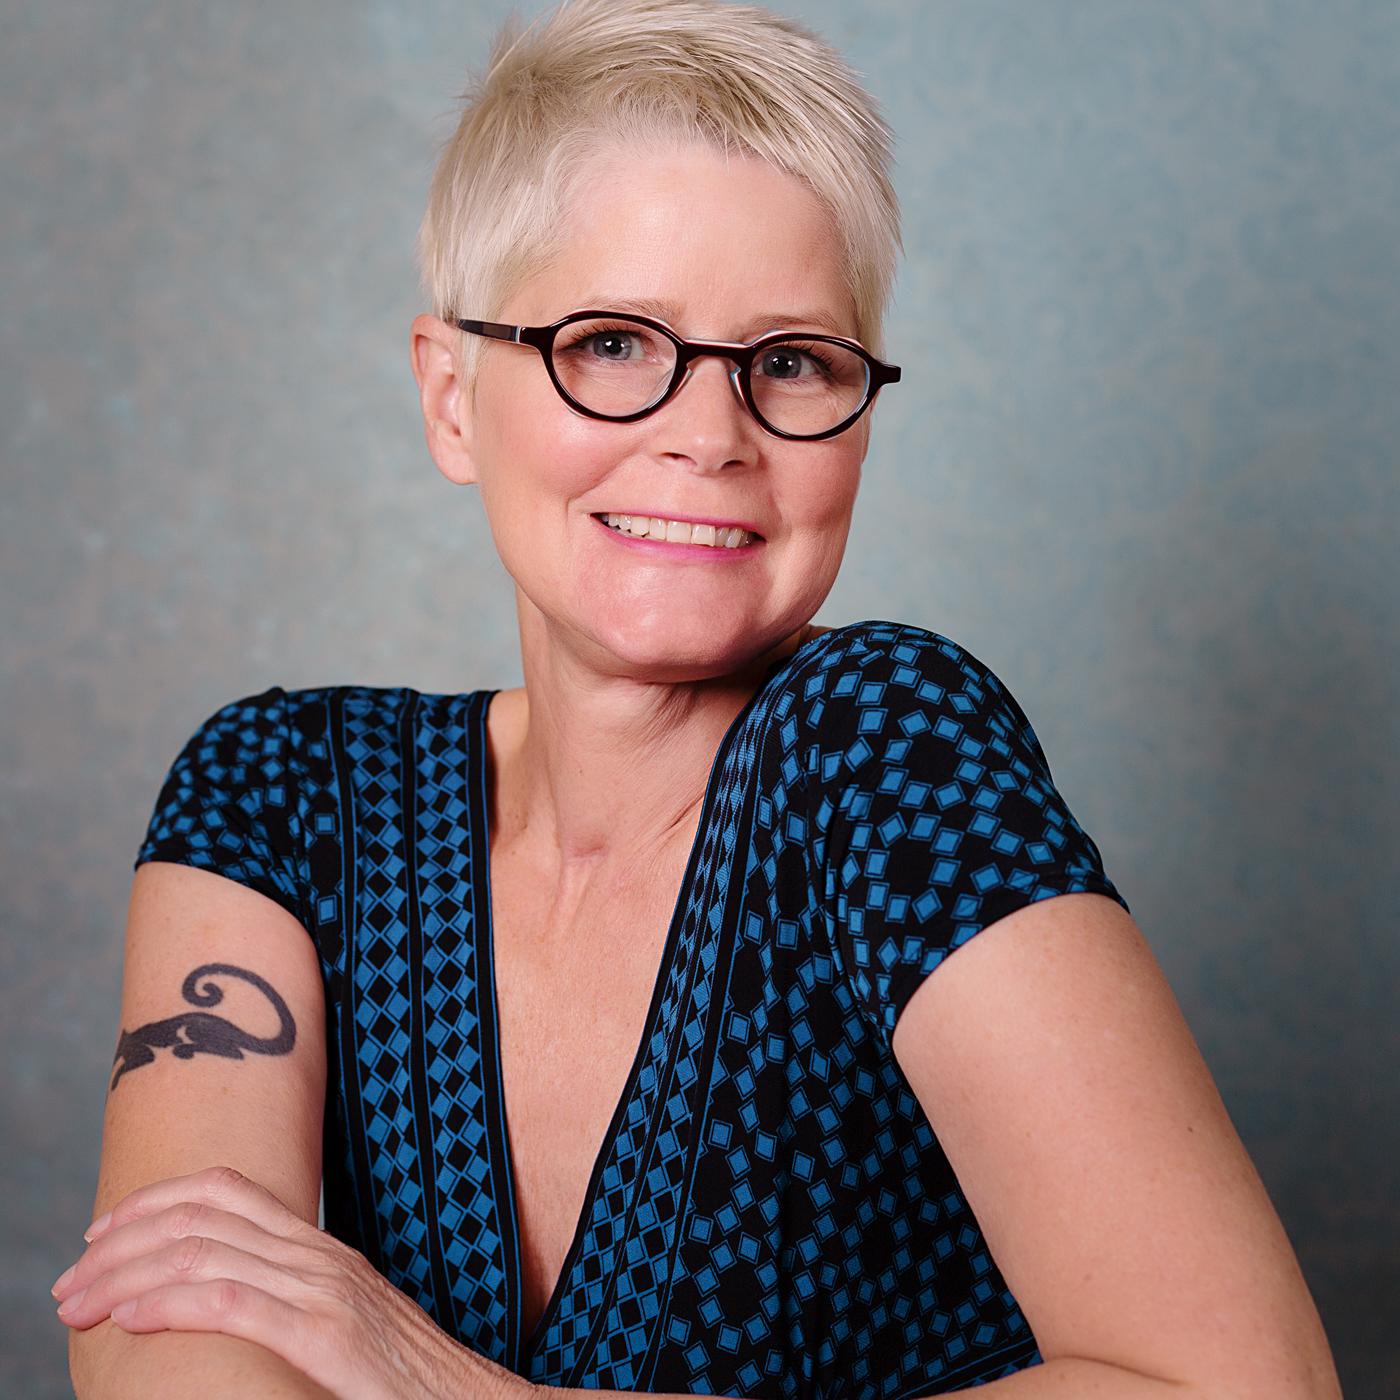 Dawn Kowalewski - Photographer and Vegan Food Fancier